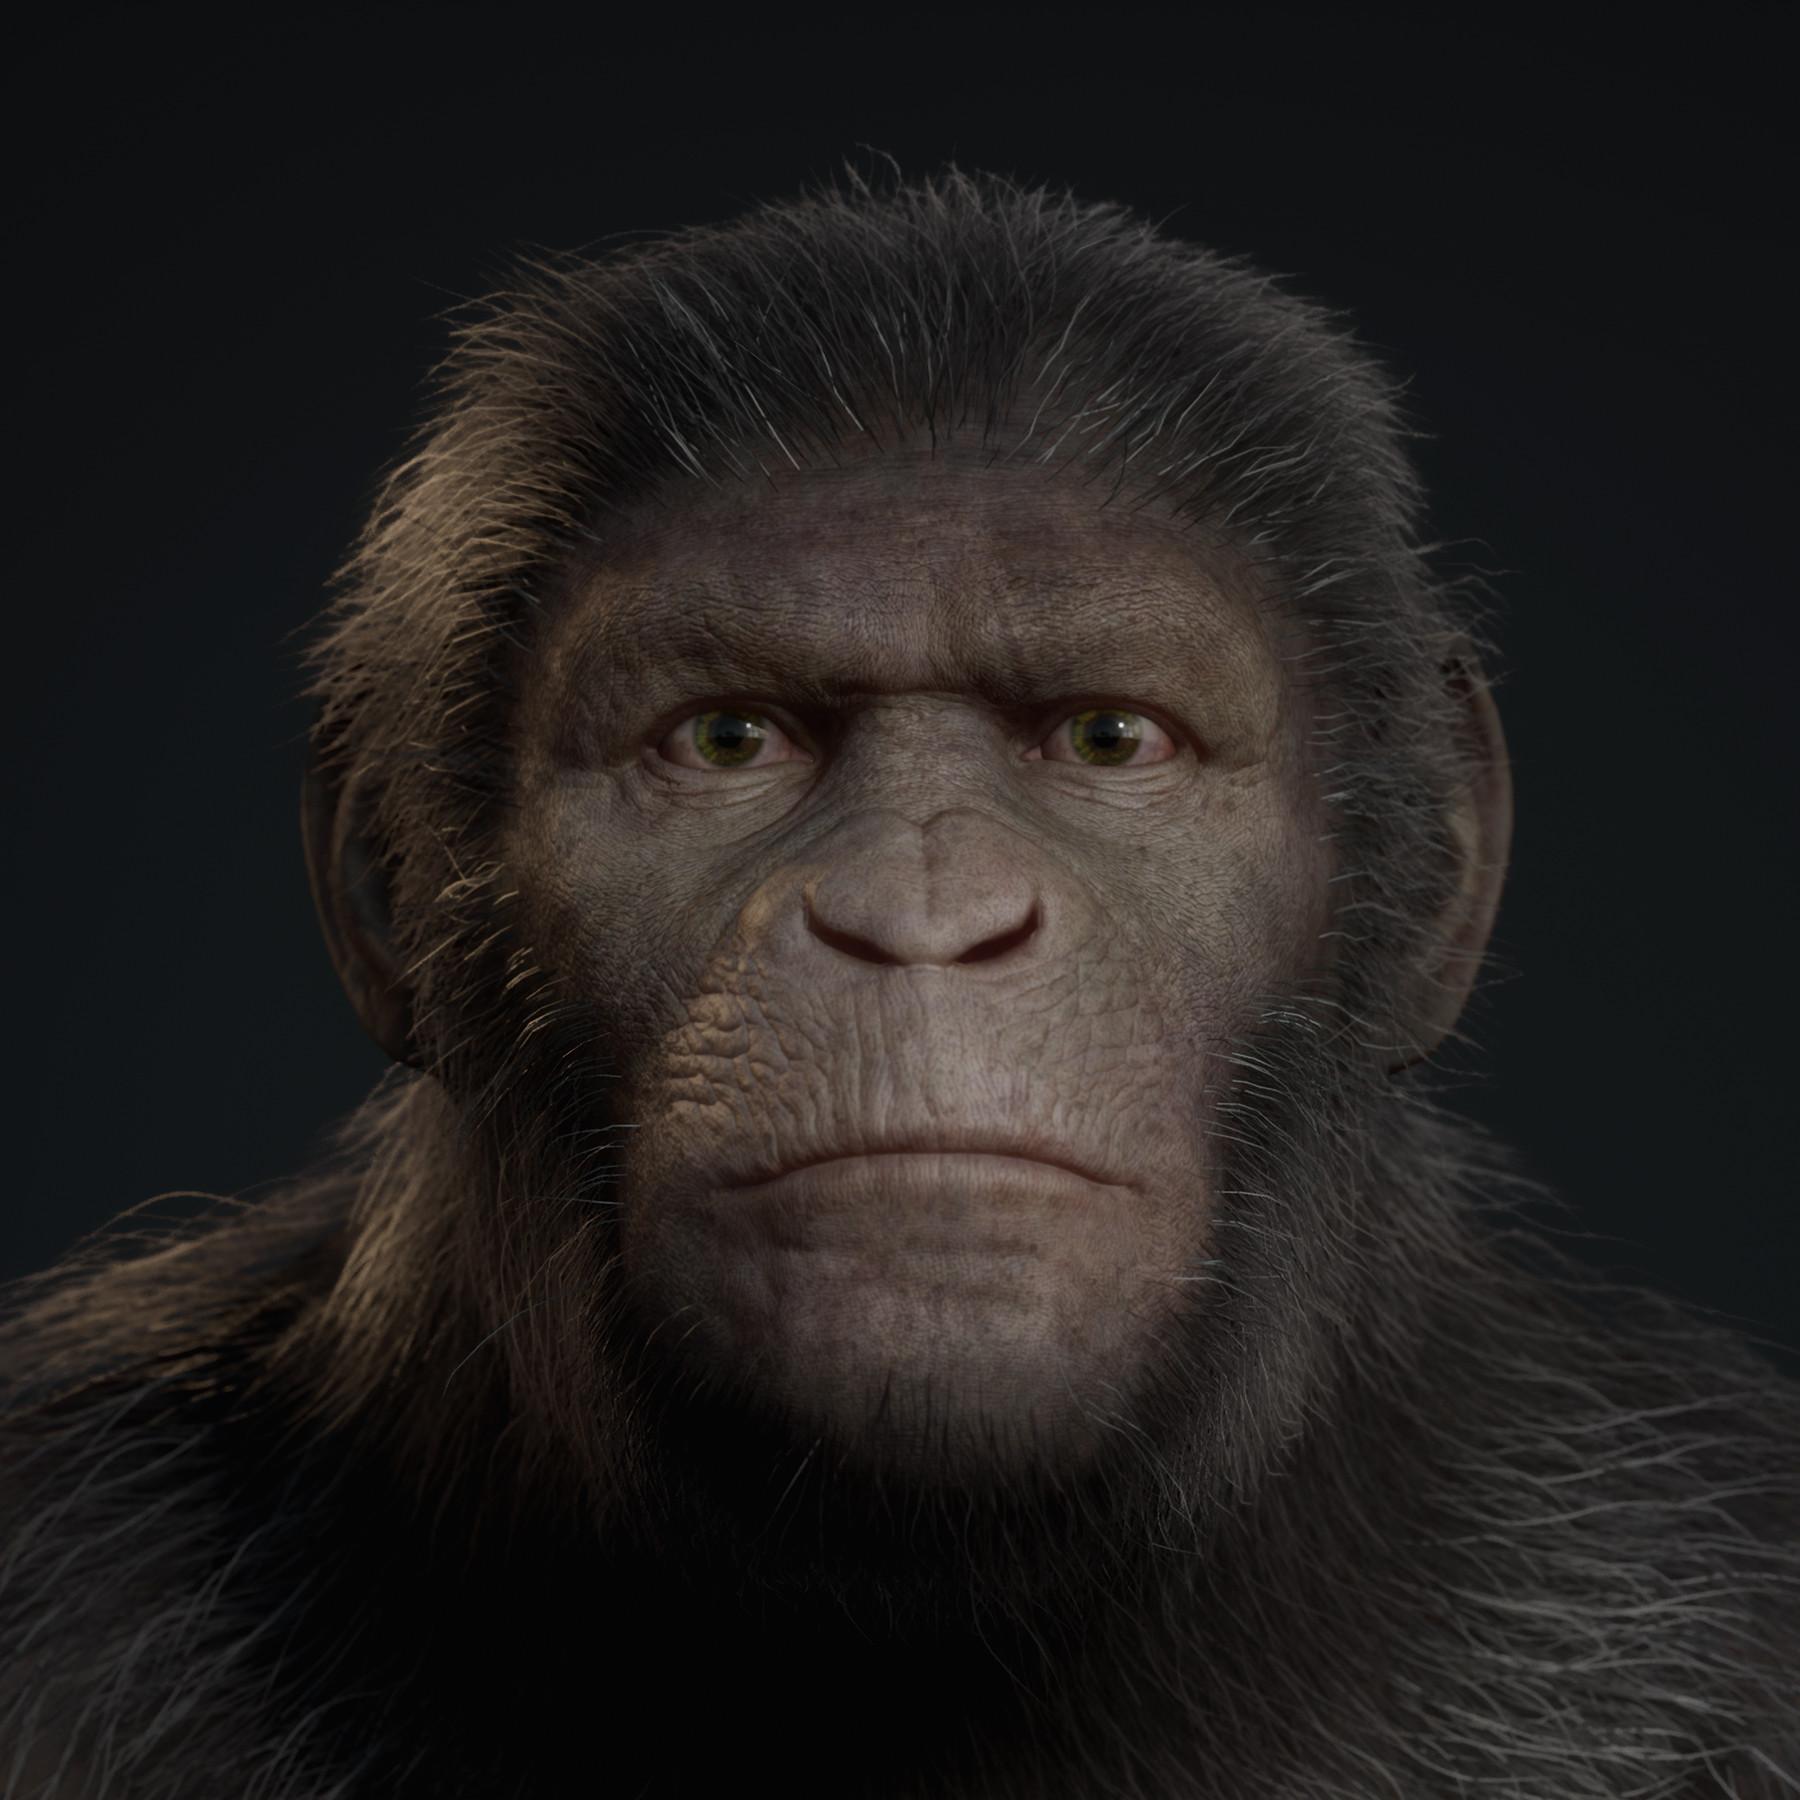 Брин - Planet of the Apes: Last Frontier Рендер